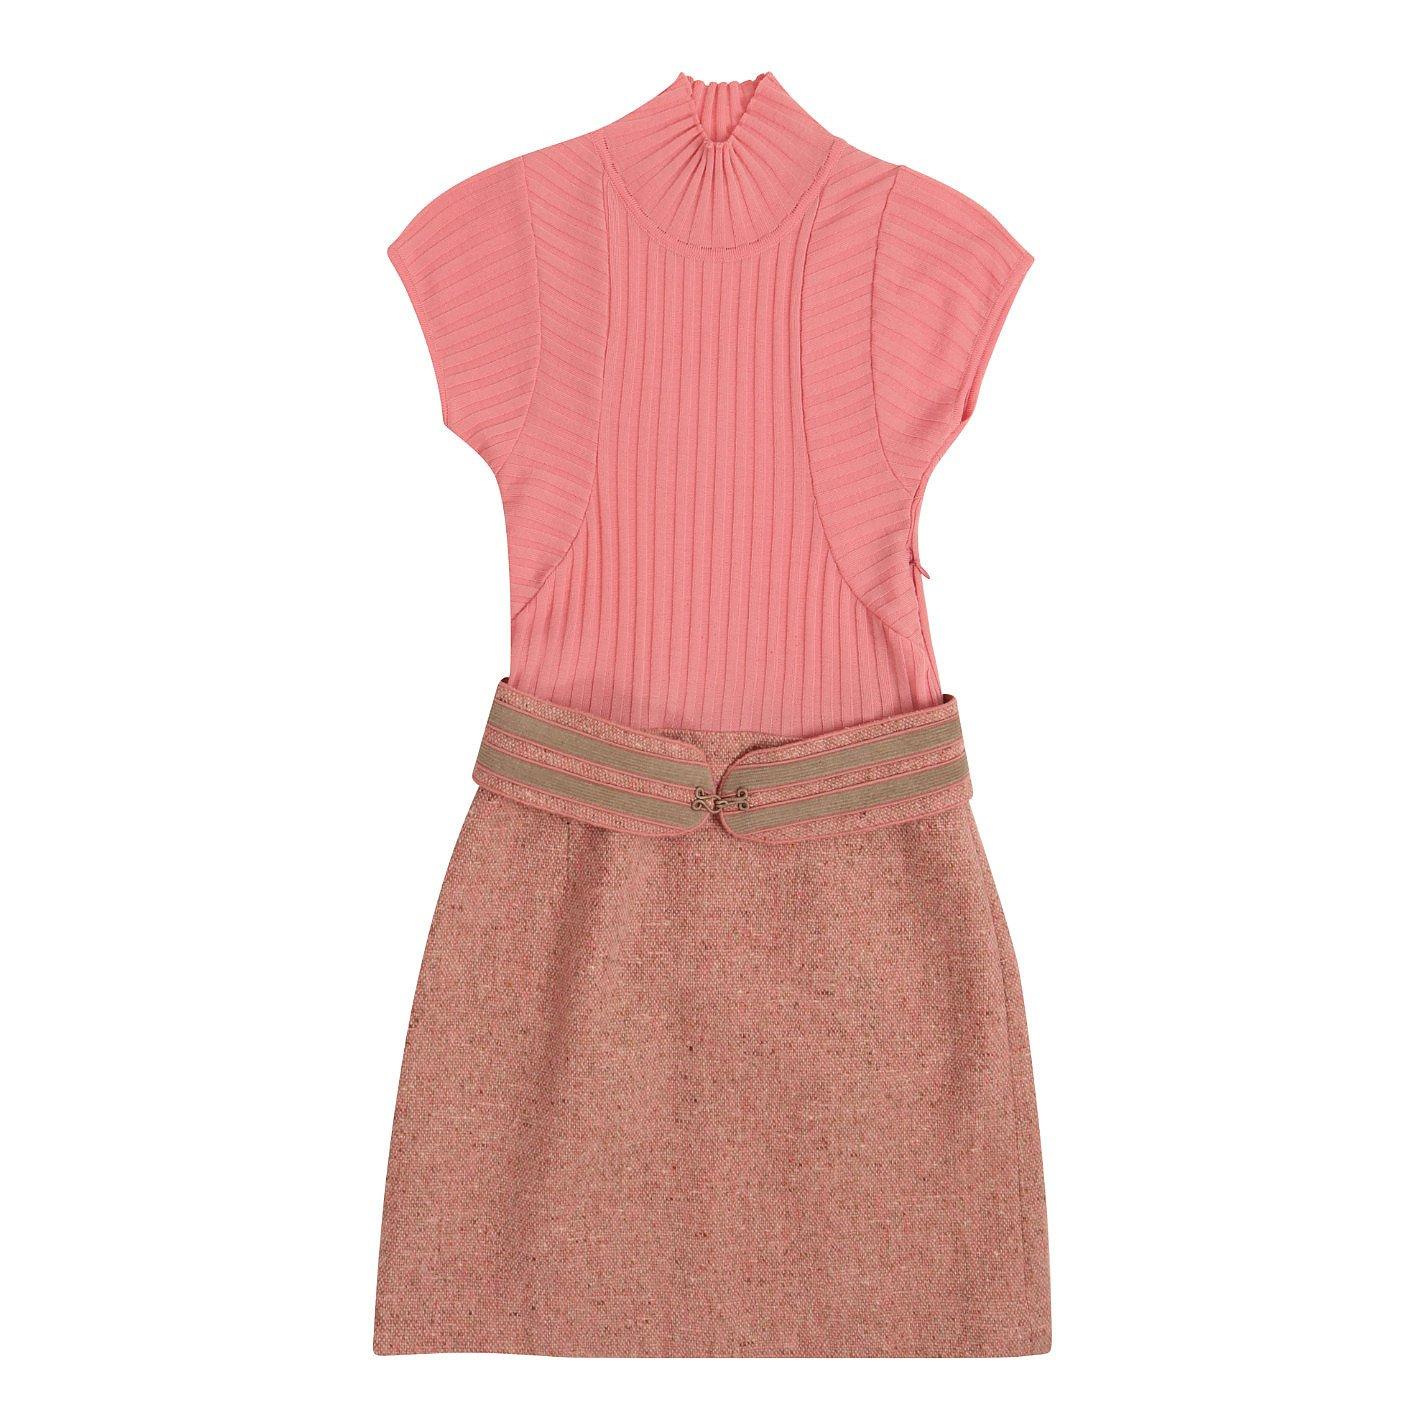 Paule Ka Belted Knit Dress